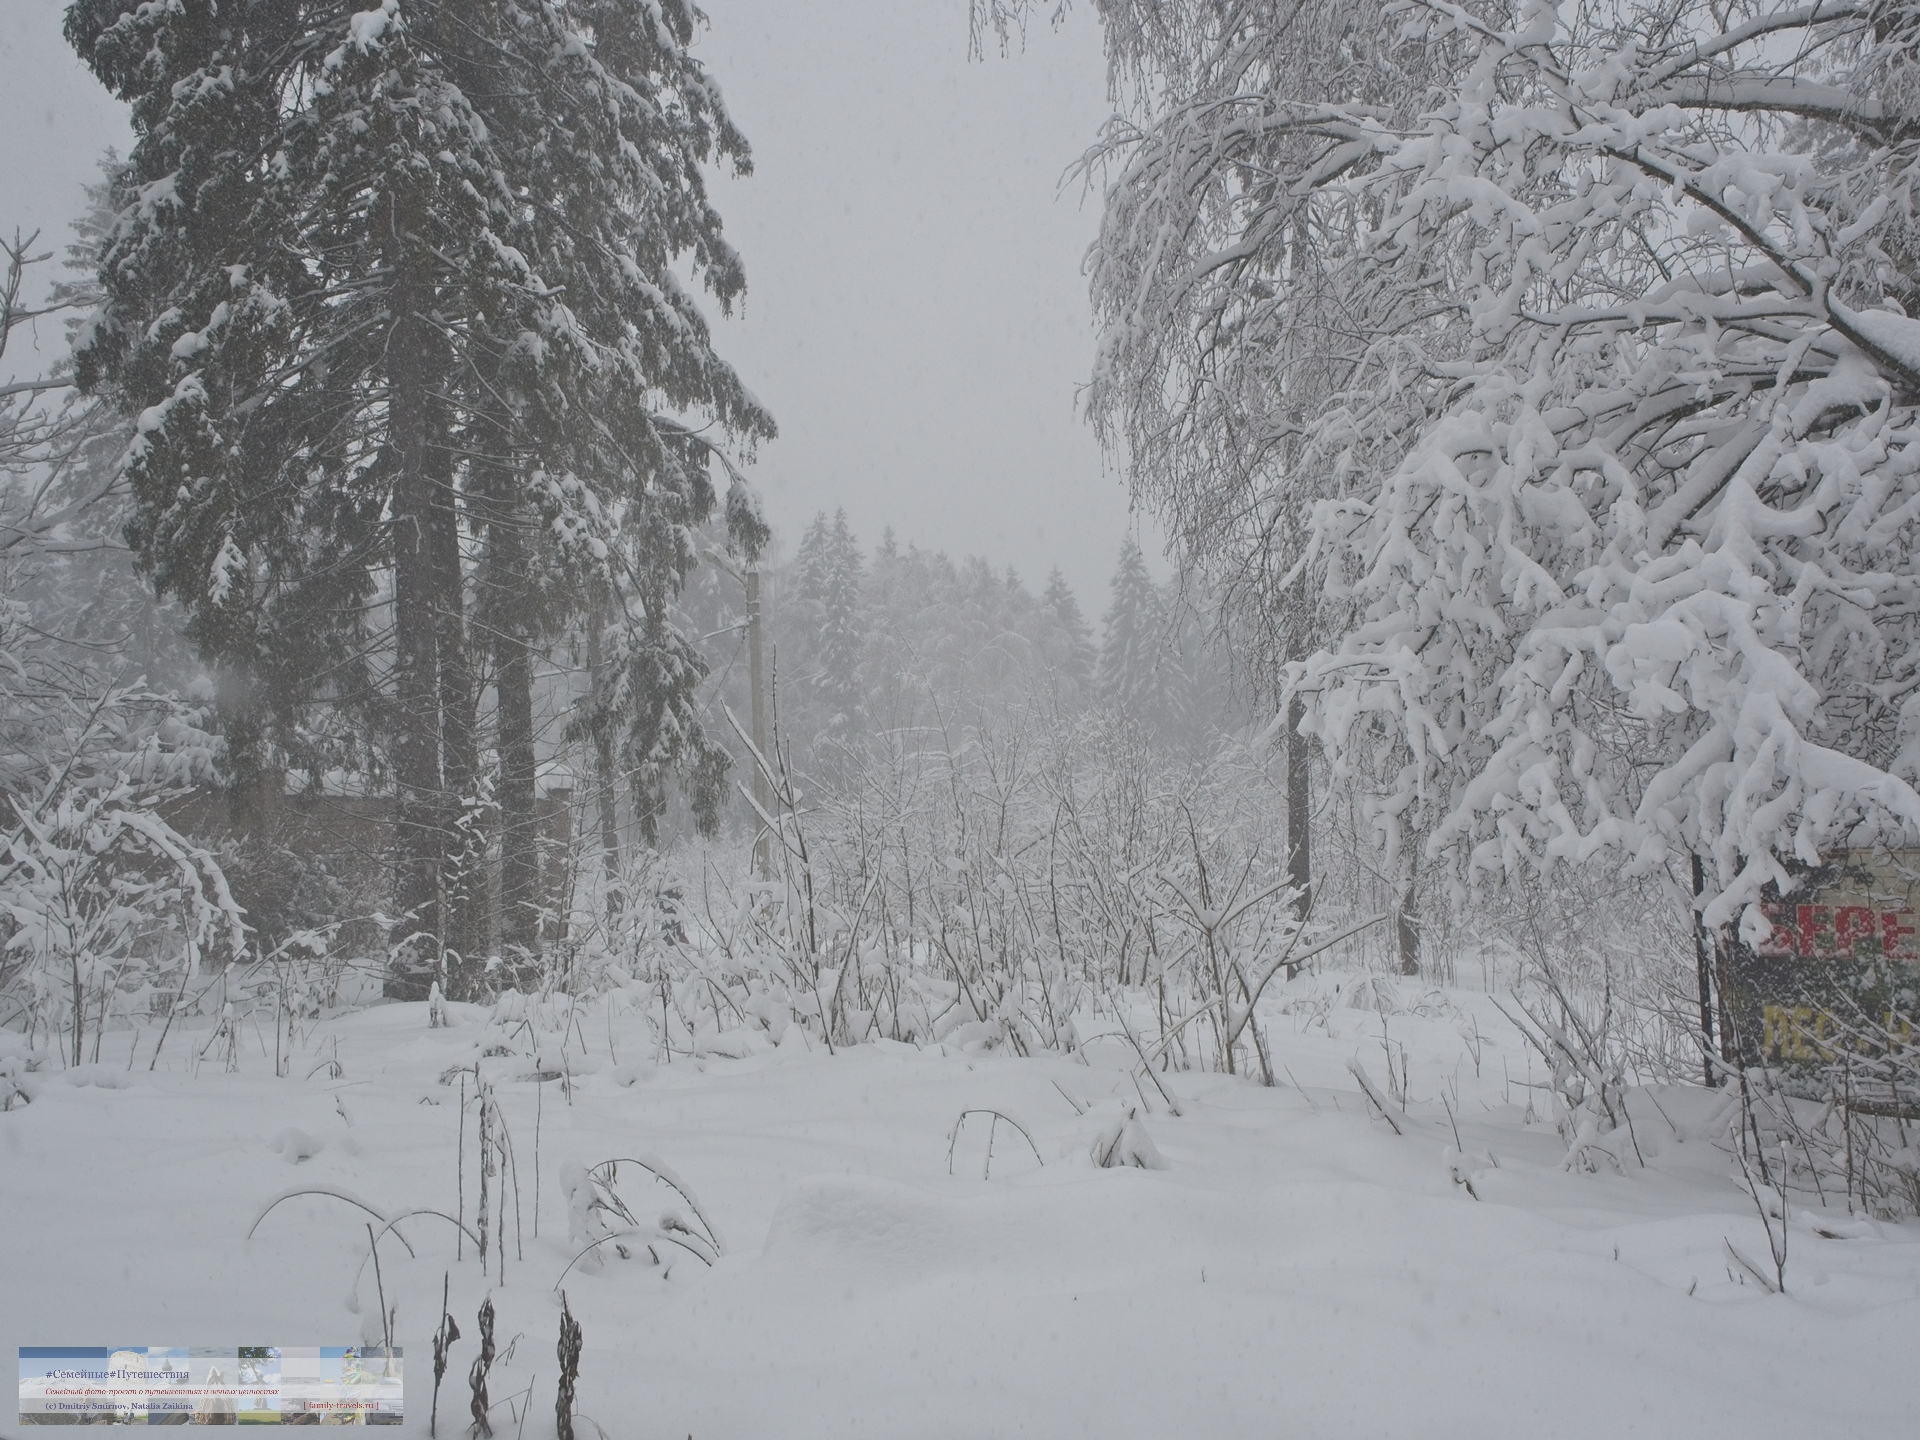 02042018-1424-Blog-048 Просто фото  Снегопад года